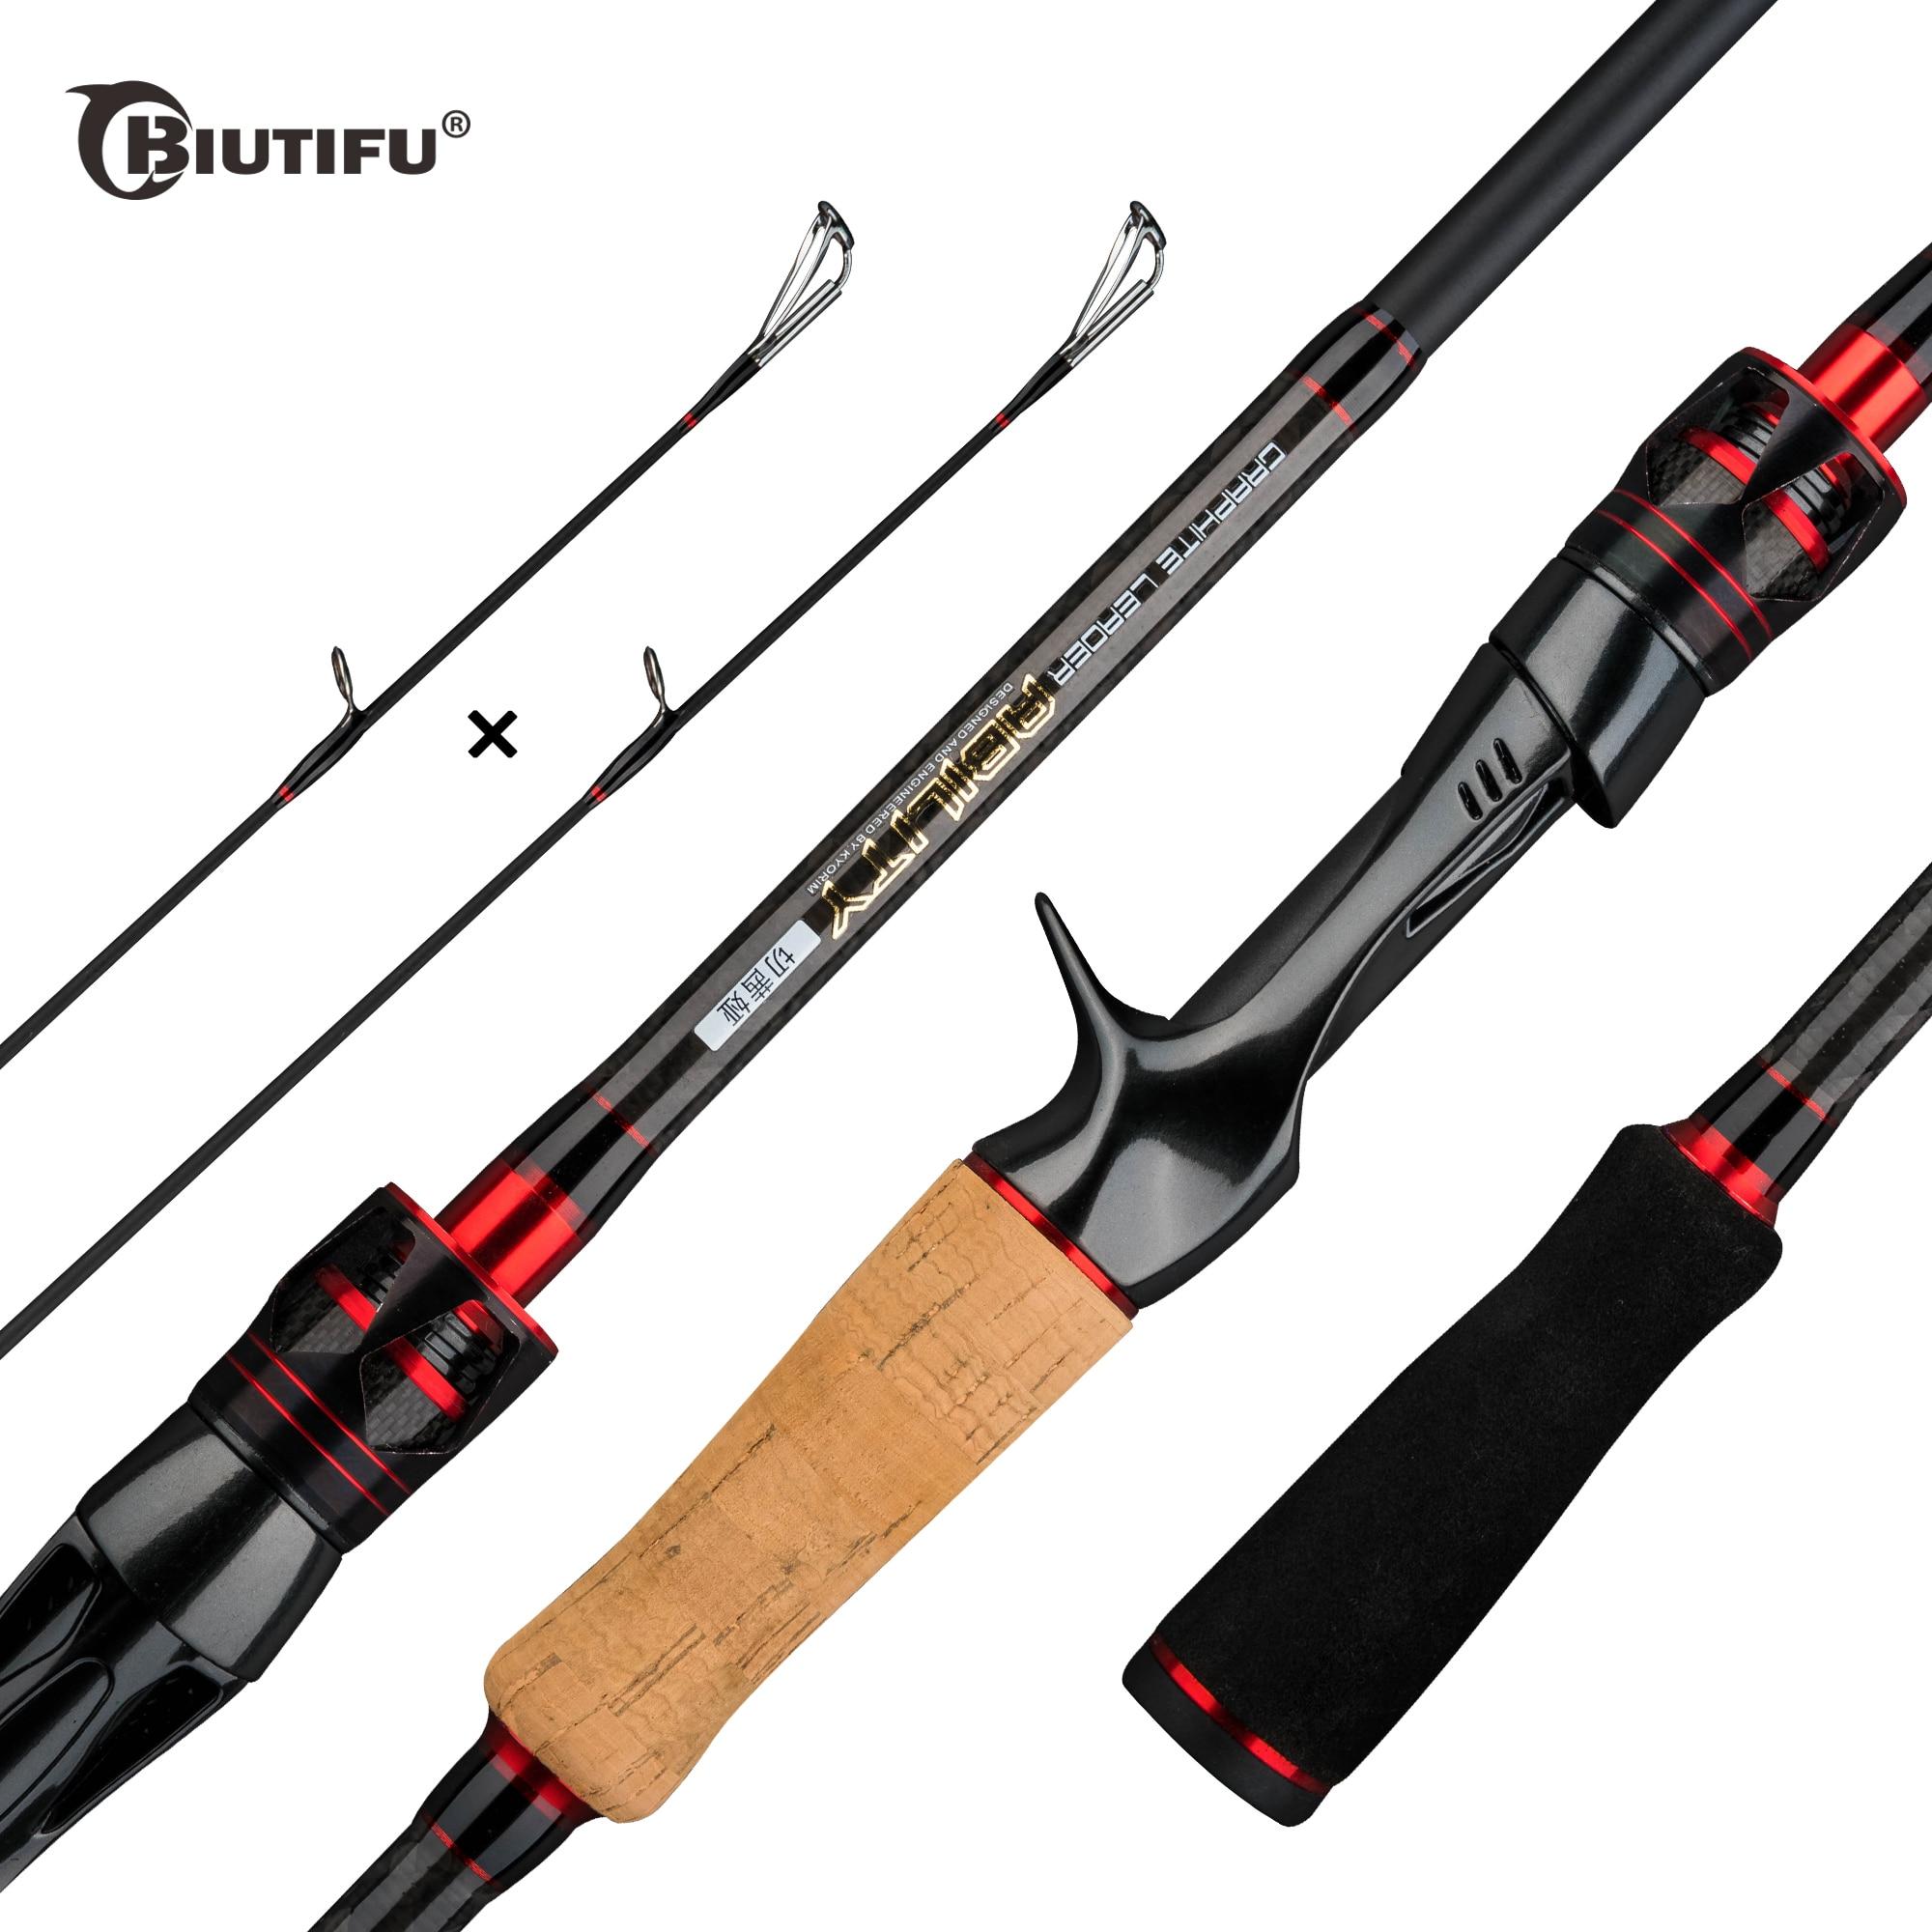 BIUTIFU-صنارة صيد دوارة ، صنارة صيد 1.8/2.1 م T800 كربون ، قسمان 2 ، 4-35 جم ، ML/m/MH